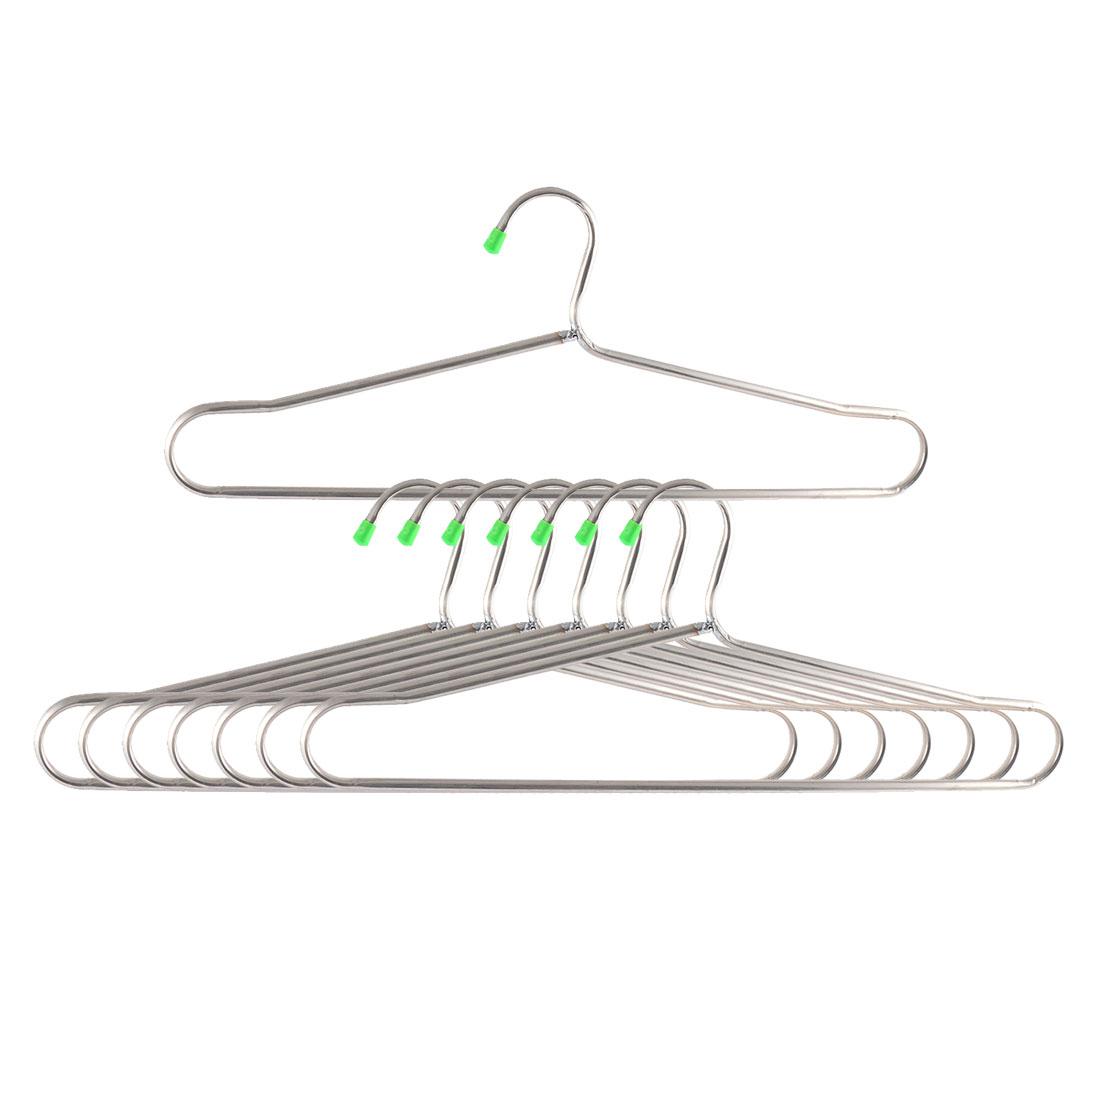 Household Metal Nonslip Clothes Towel Skirts Hangers Hooks Silver Tone 8pcs